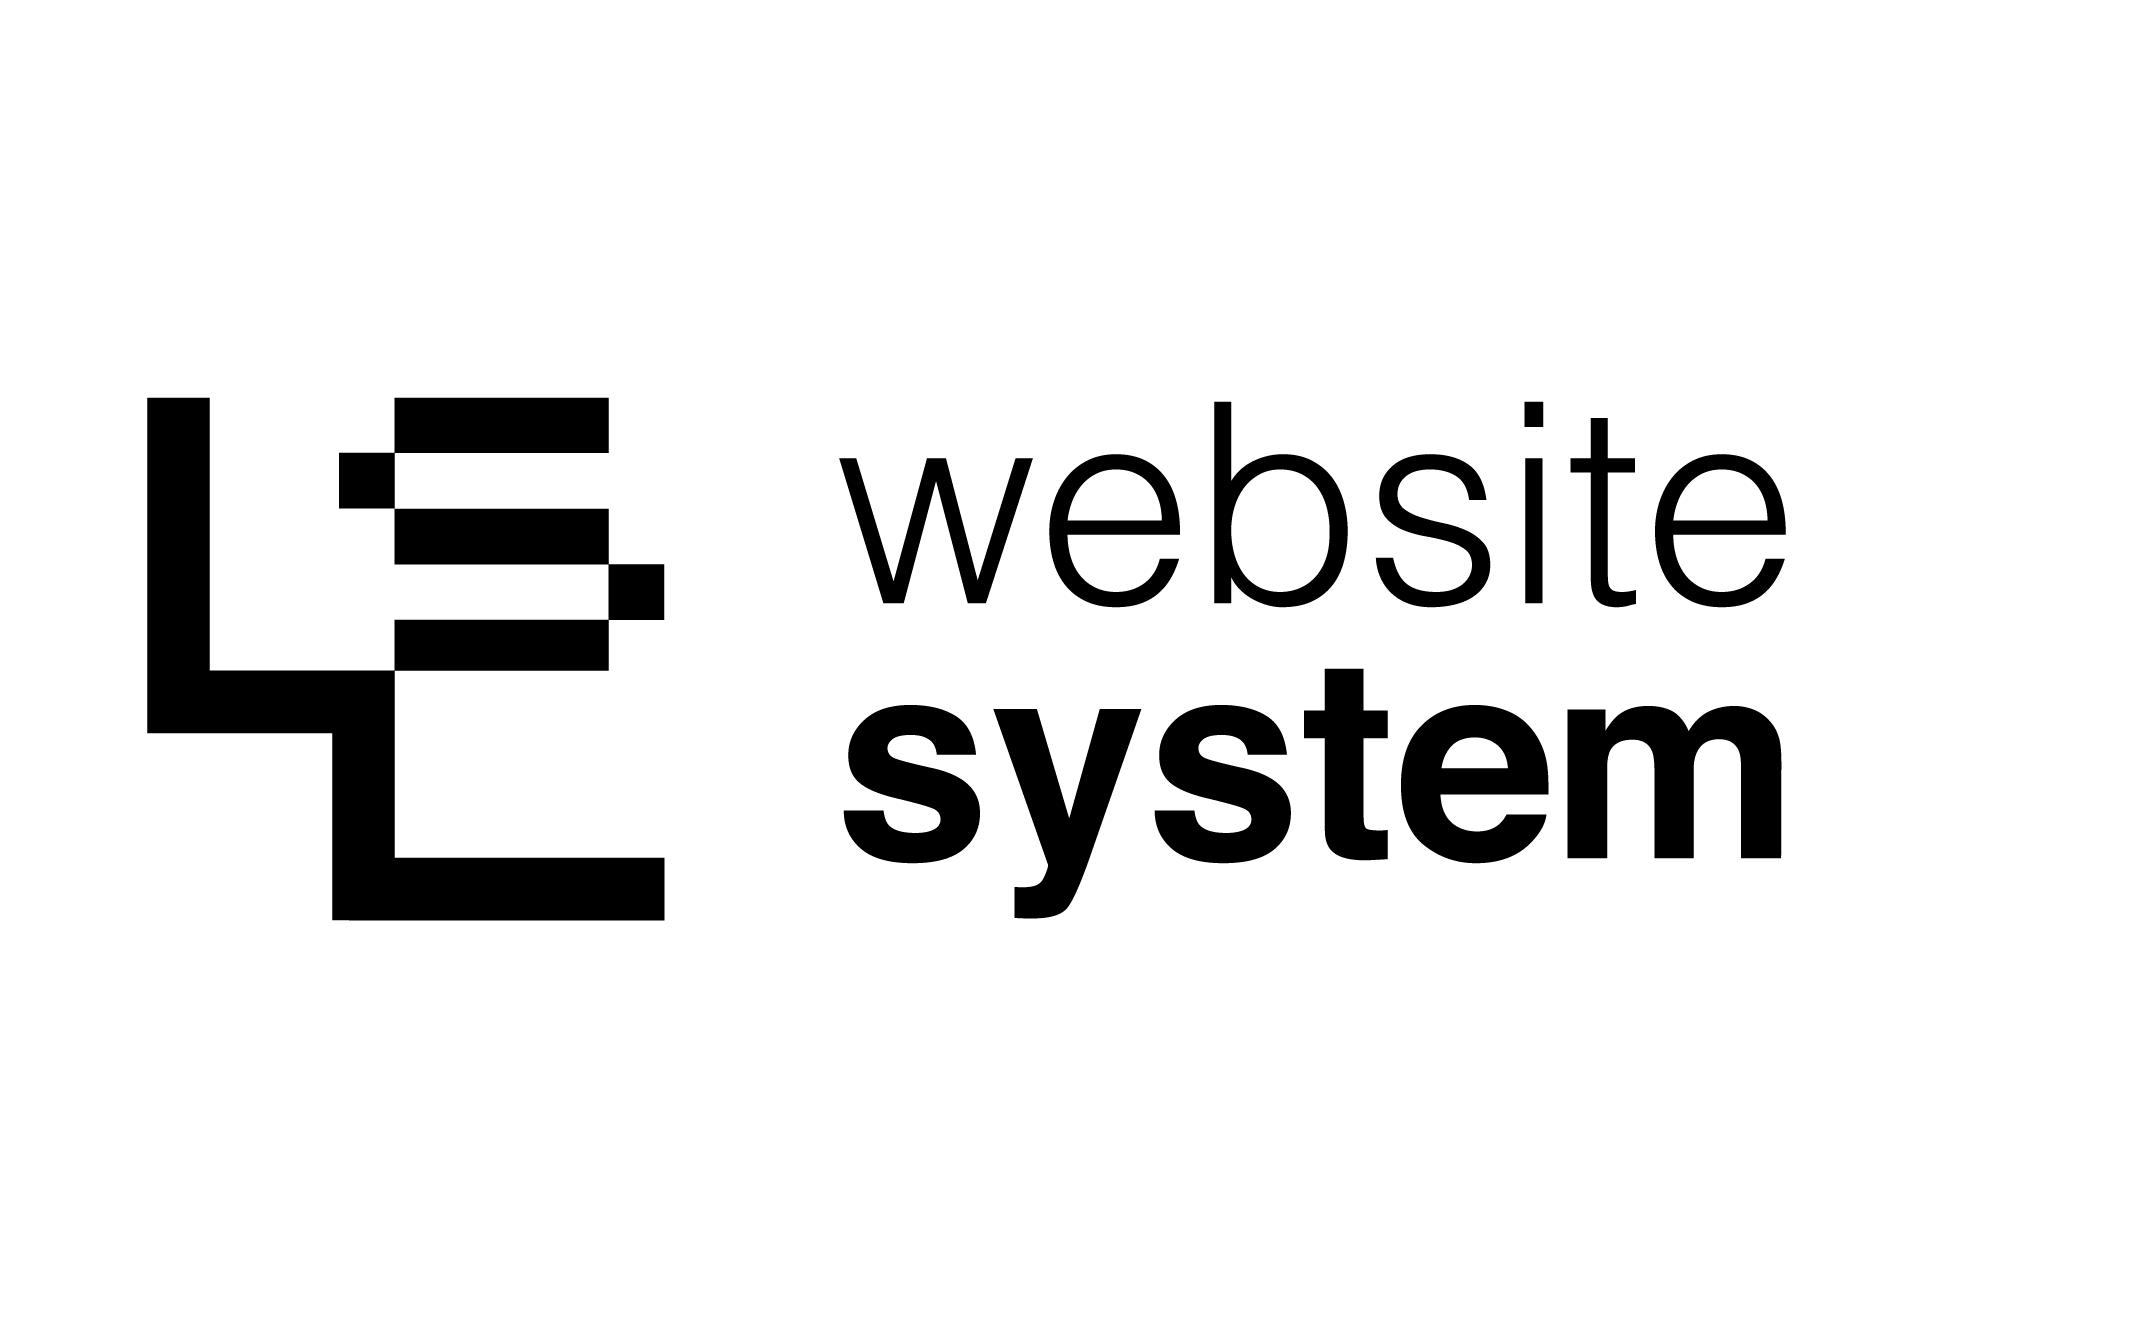 Website Stystem